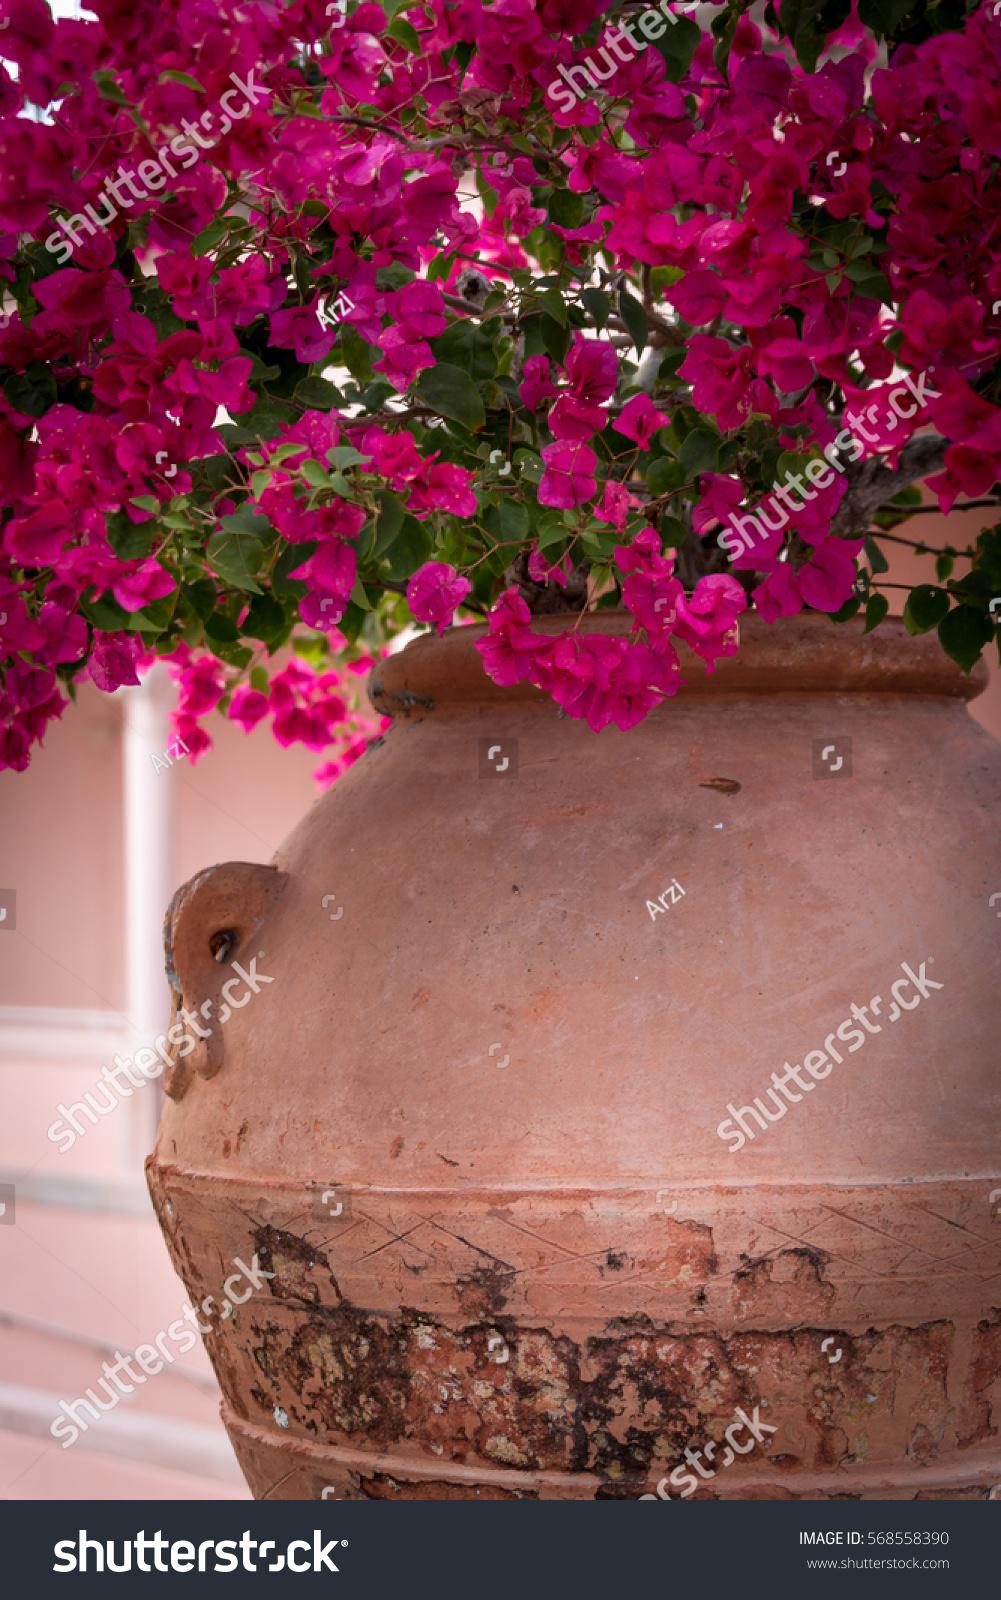 Fuchsia Color Bougainvillea Flowers Big Old Stock Photo (100% Legal ...